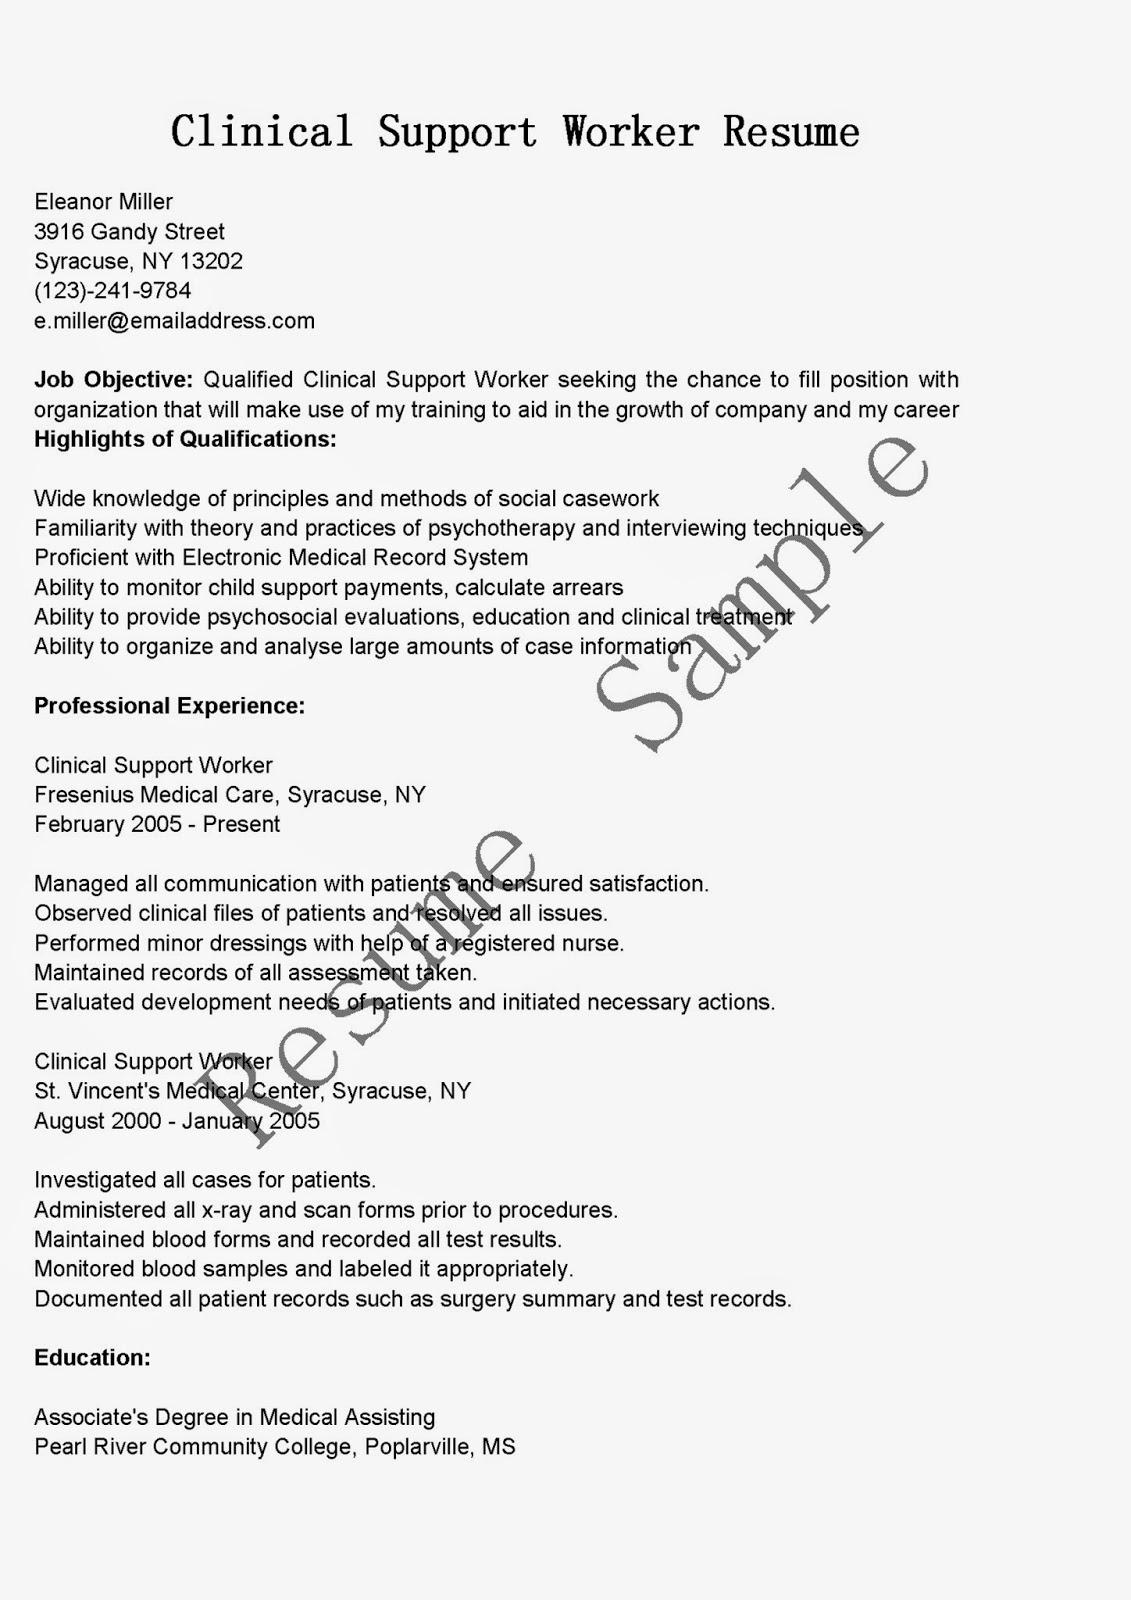 resume samples clinical support worker resume sample